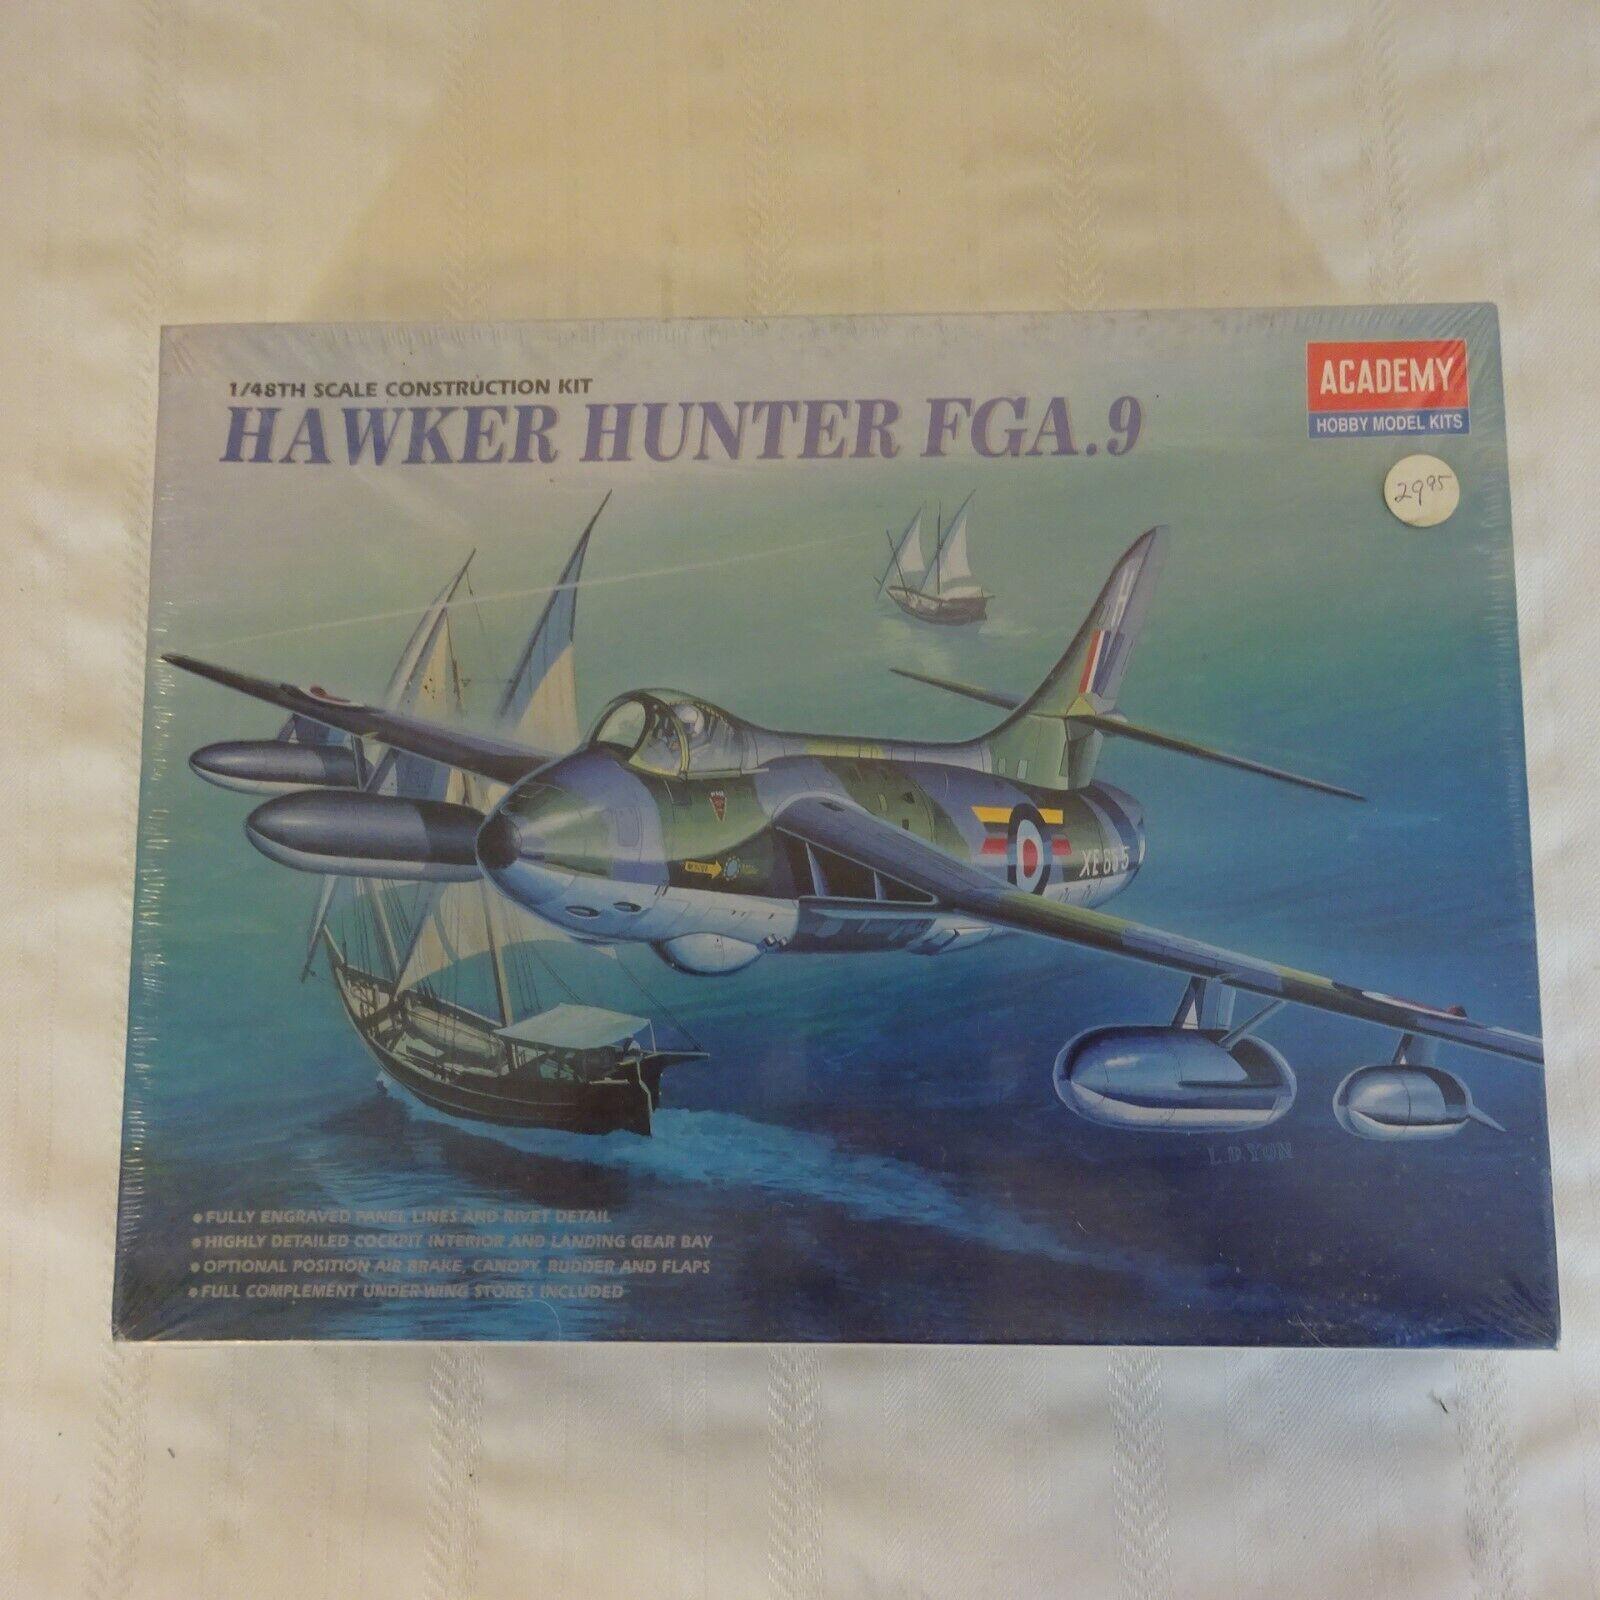 1 48 ACADEMY HAWKER HUNTER FGA.9 MODEL KIT FACTORY SEALED